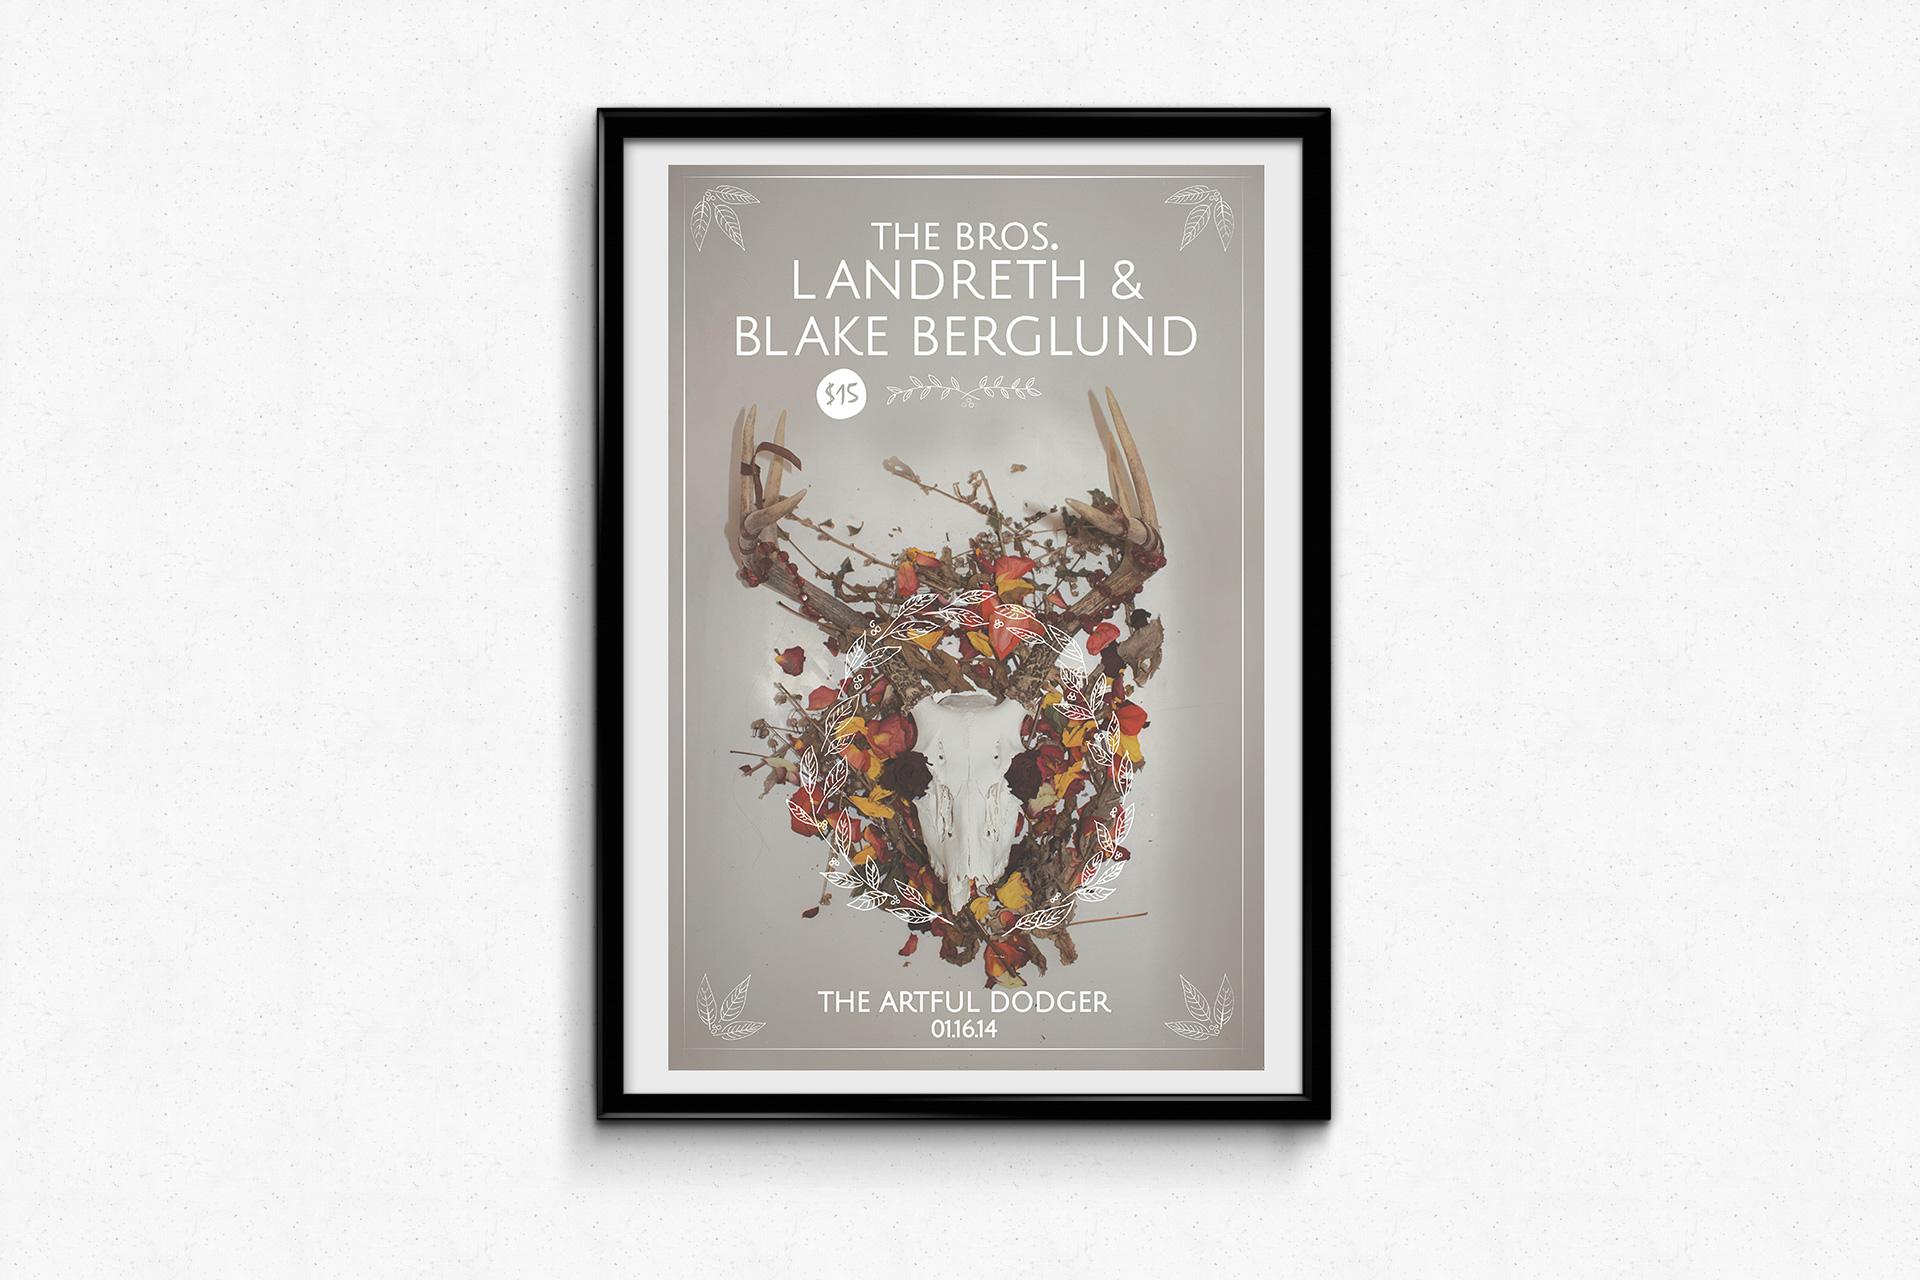 The Bros. Landreth & Blake Burgland